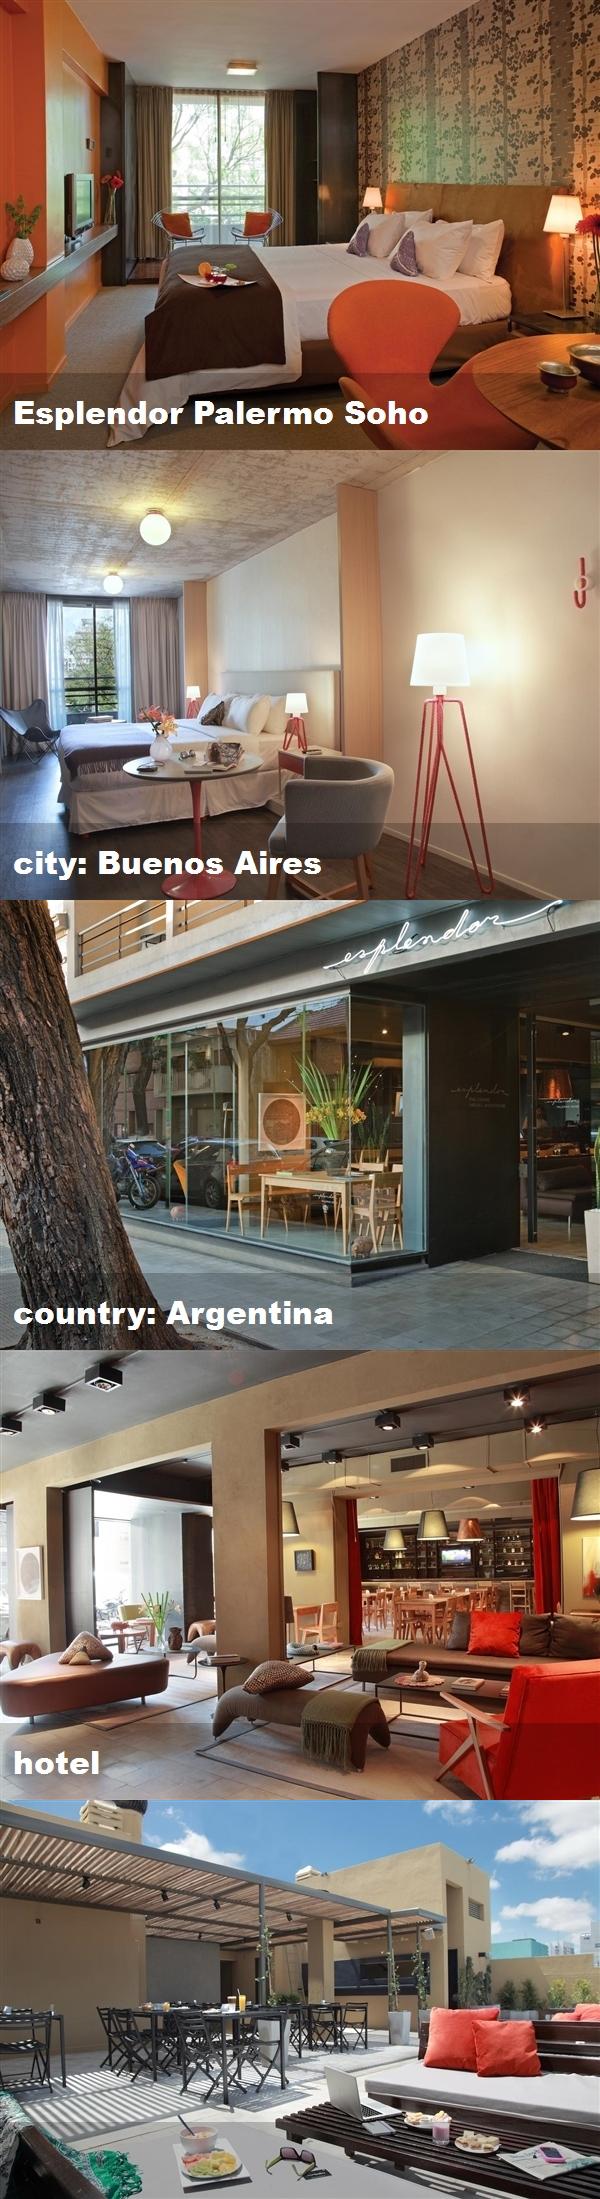 Esplendor Palermo Soho, city: Buenos Aires, country ...